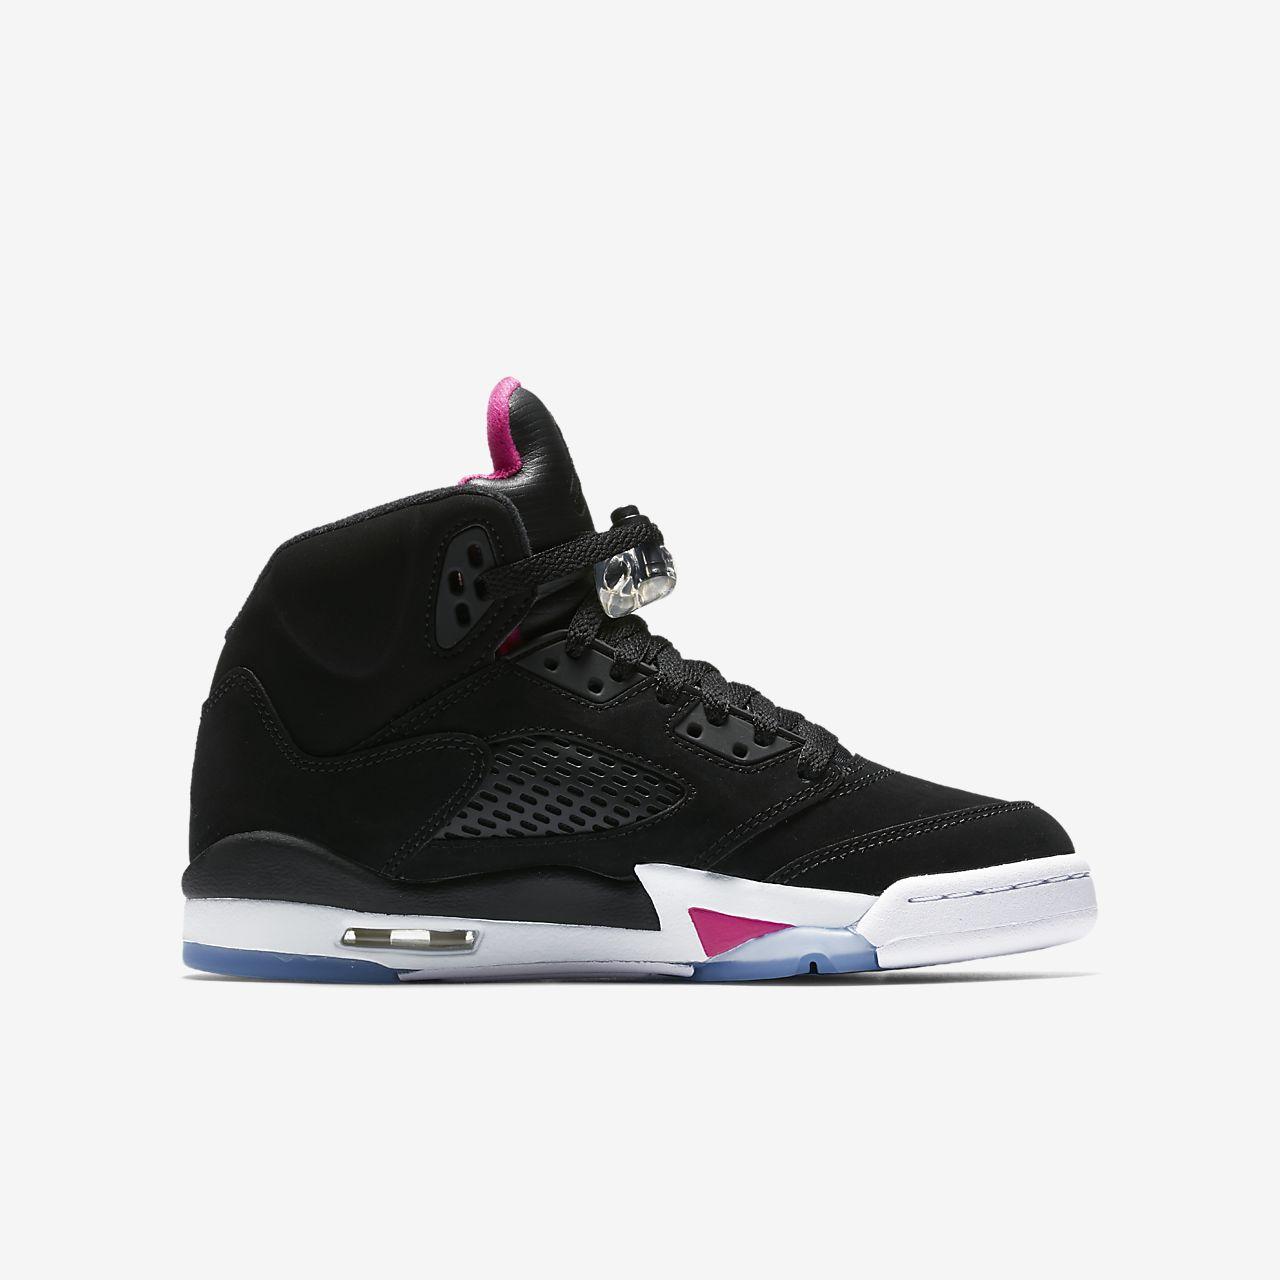 pretty nice 521fe a9385 ... Air Jordan 5 Retro Older Kids  Shoe